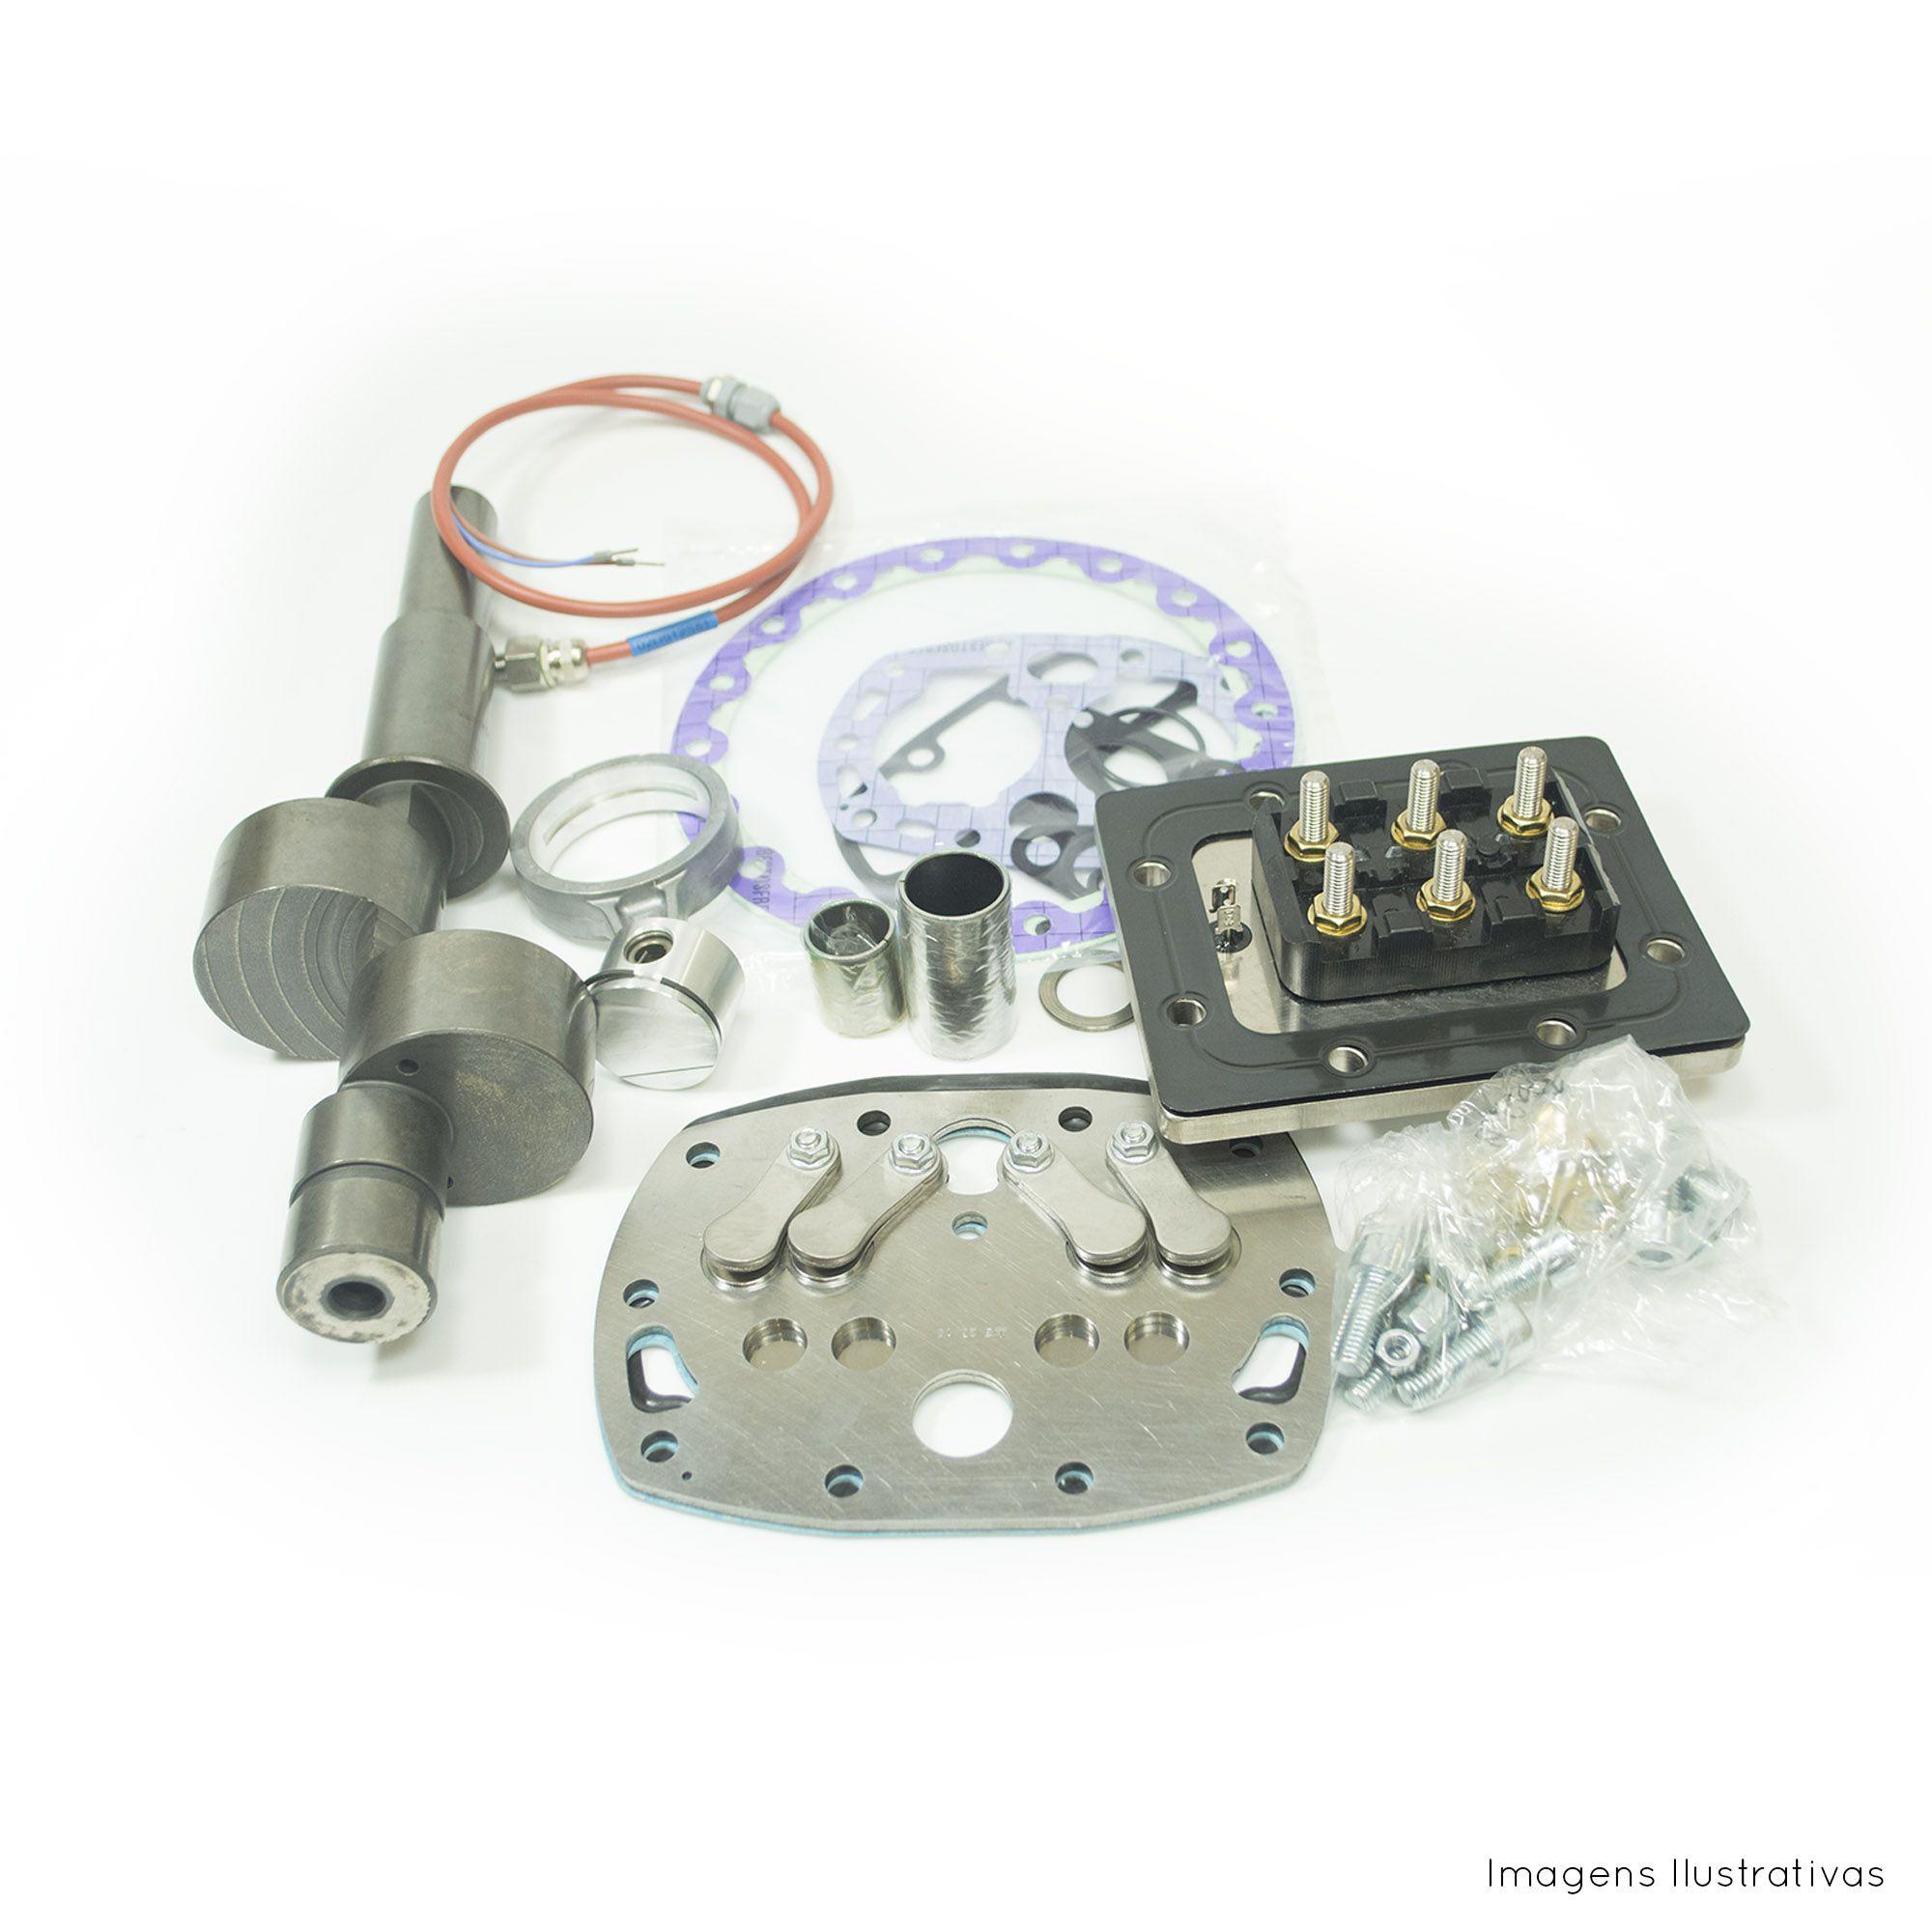 Kit de conexão elétrica 900-10511